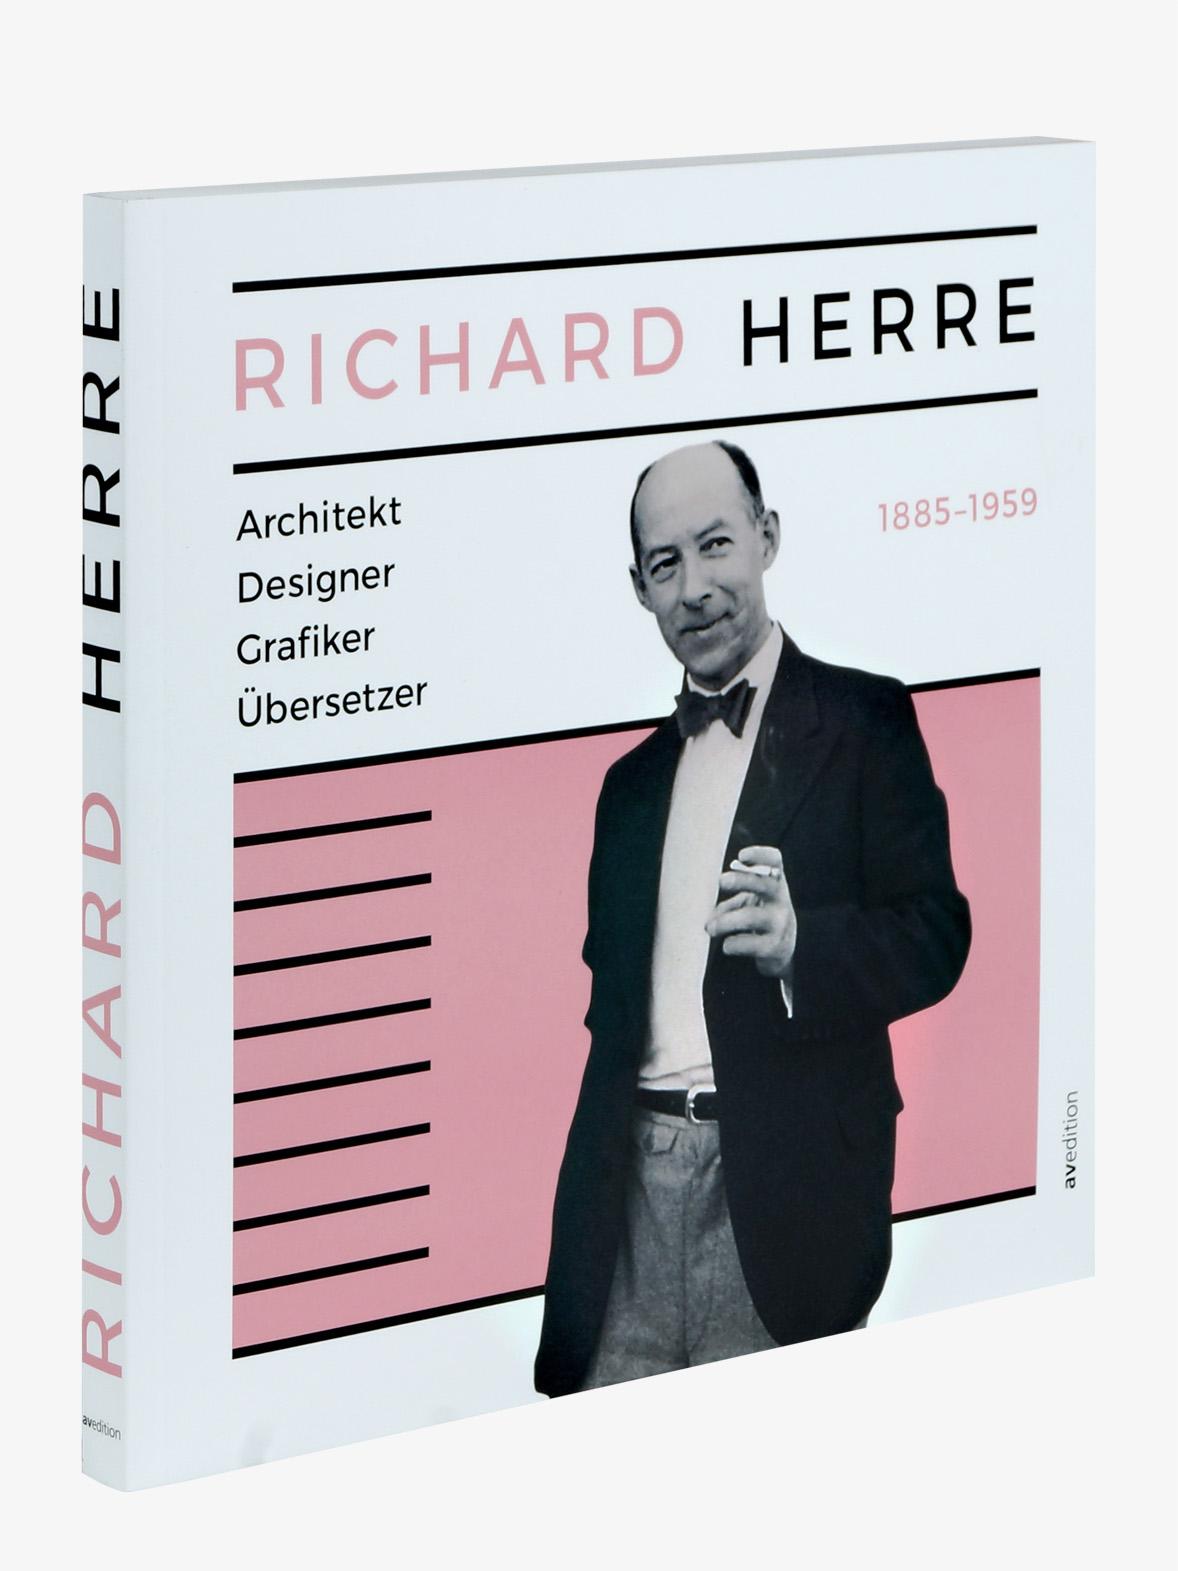 Richard Herre